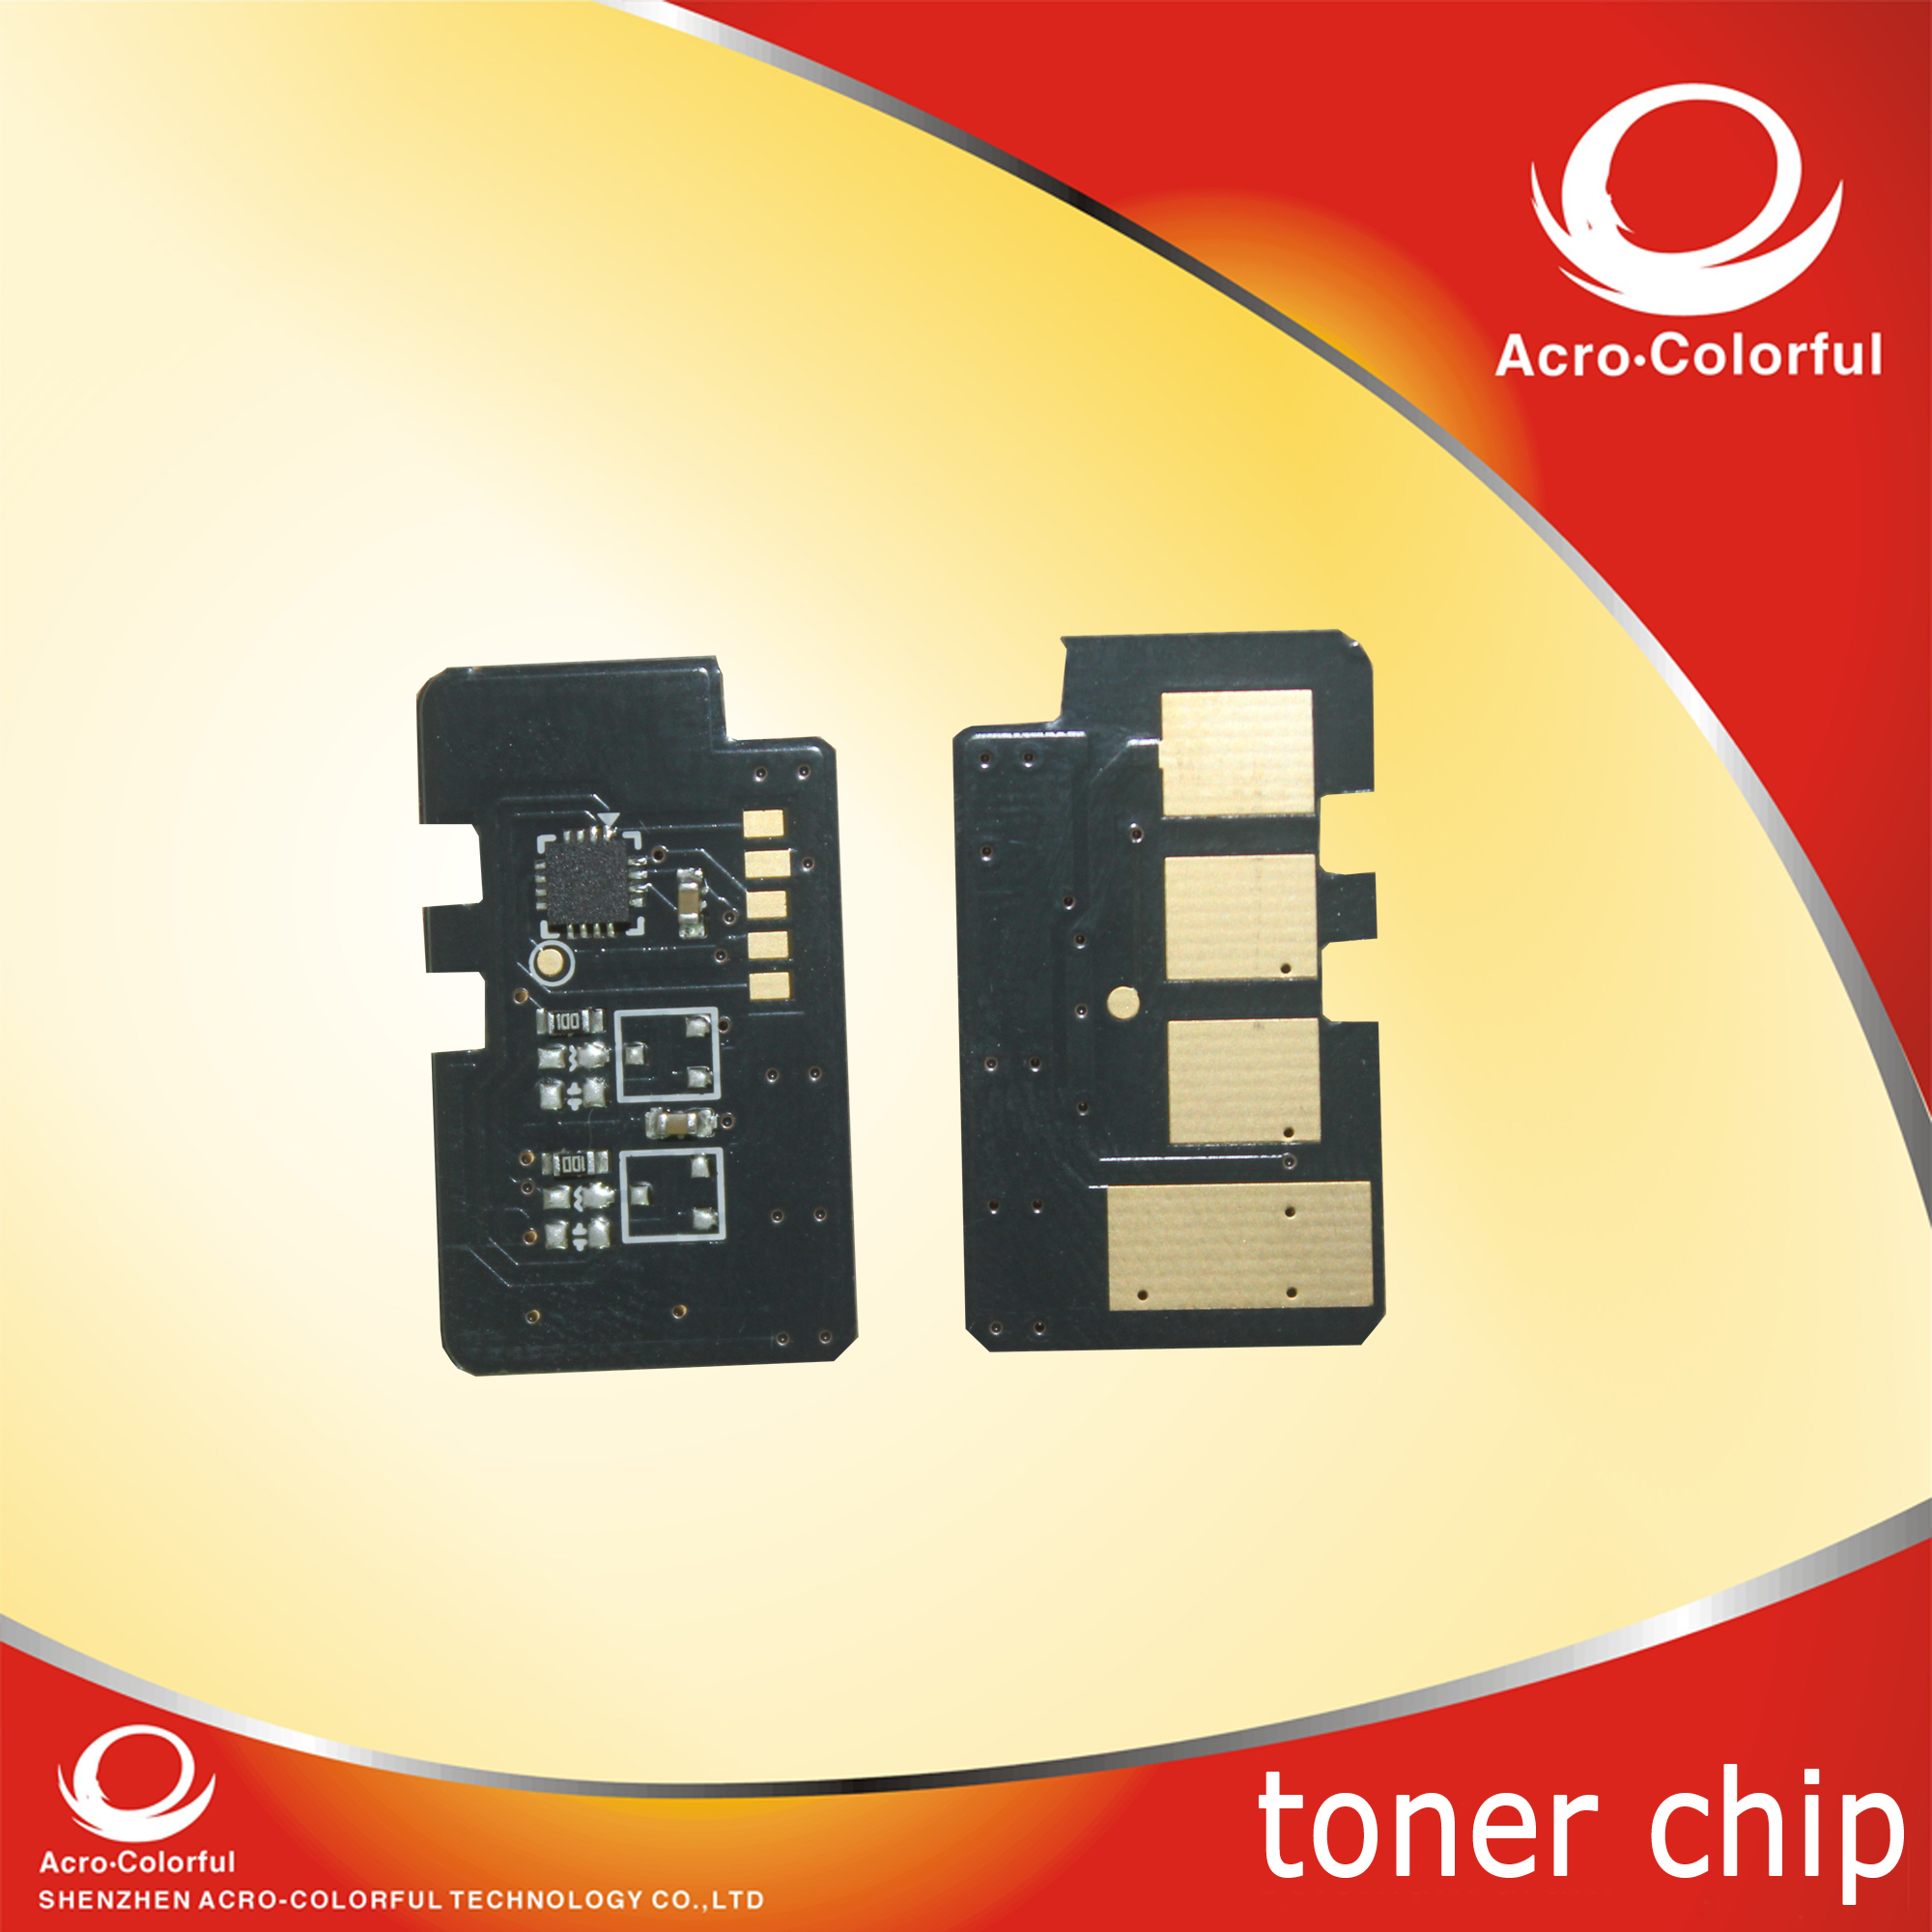 toner chip reset toner cartridge for xerox 3070 4070 5070